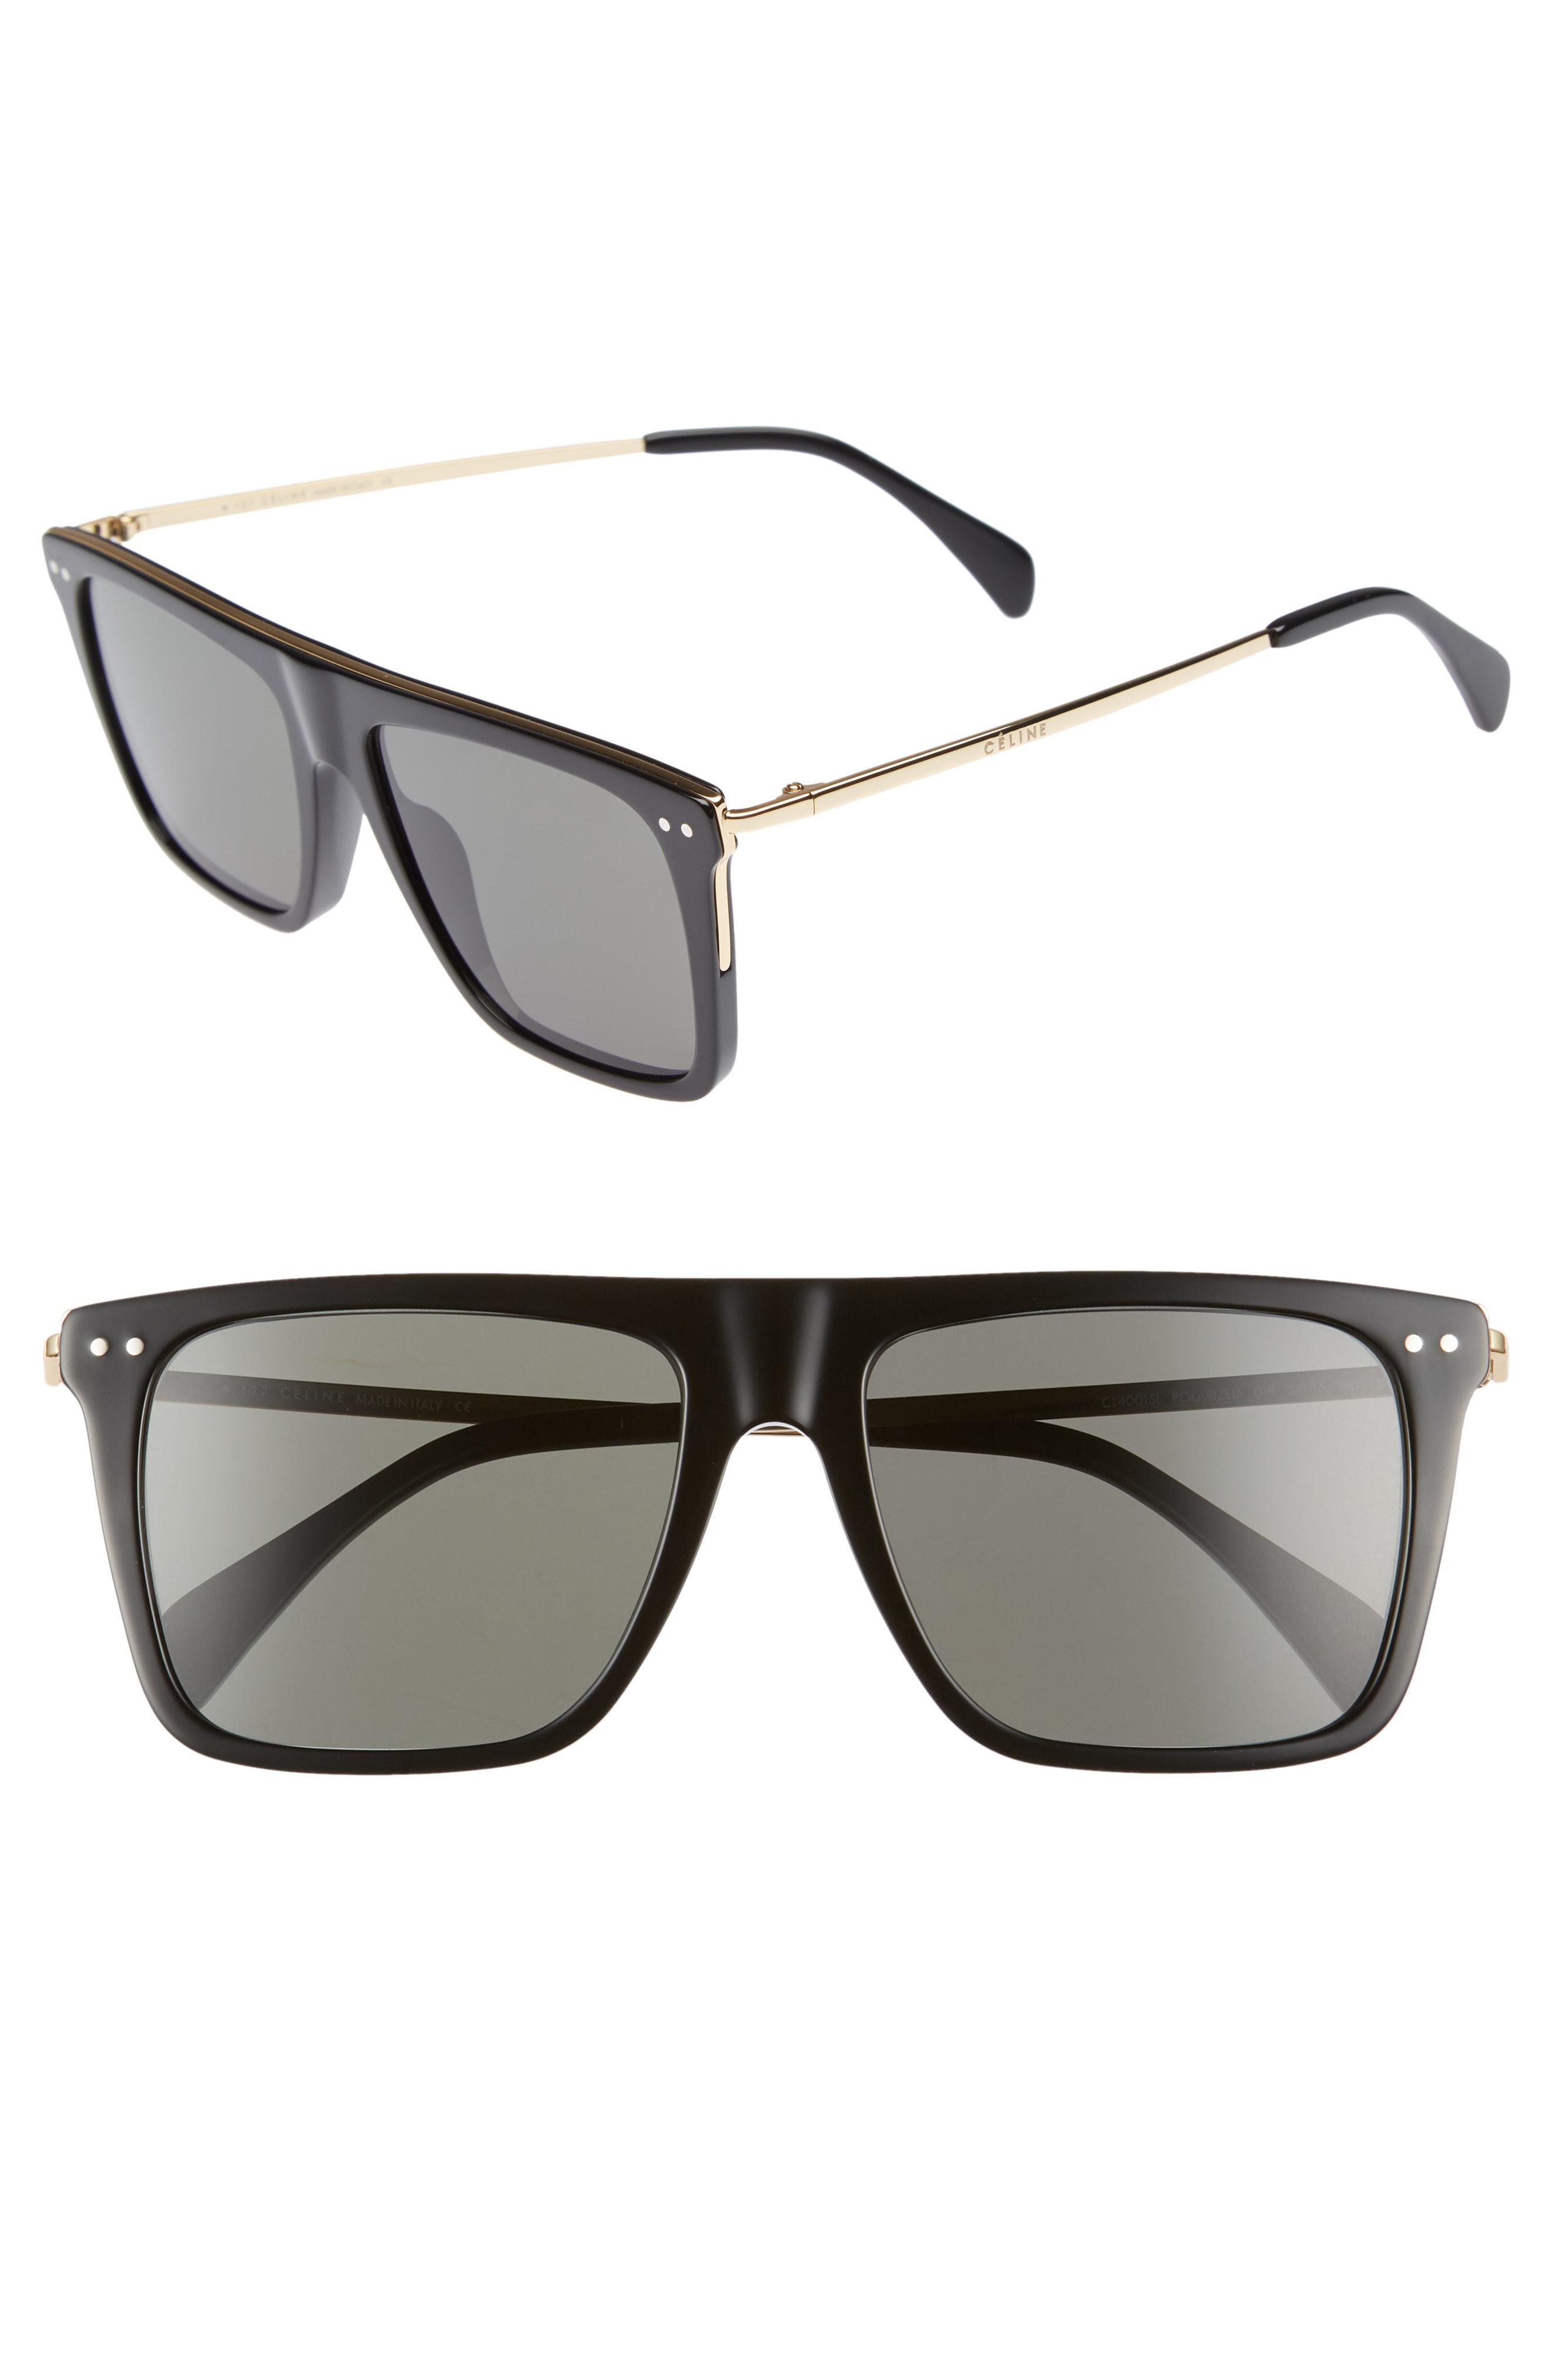 22649b6914 Céline. Women s 54mm Polarized Flat Top Sunglasses